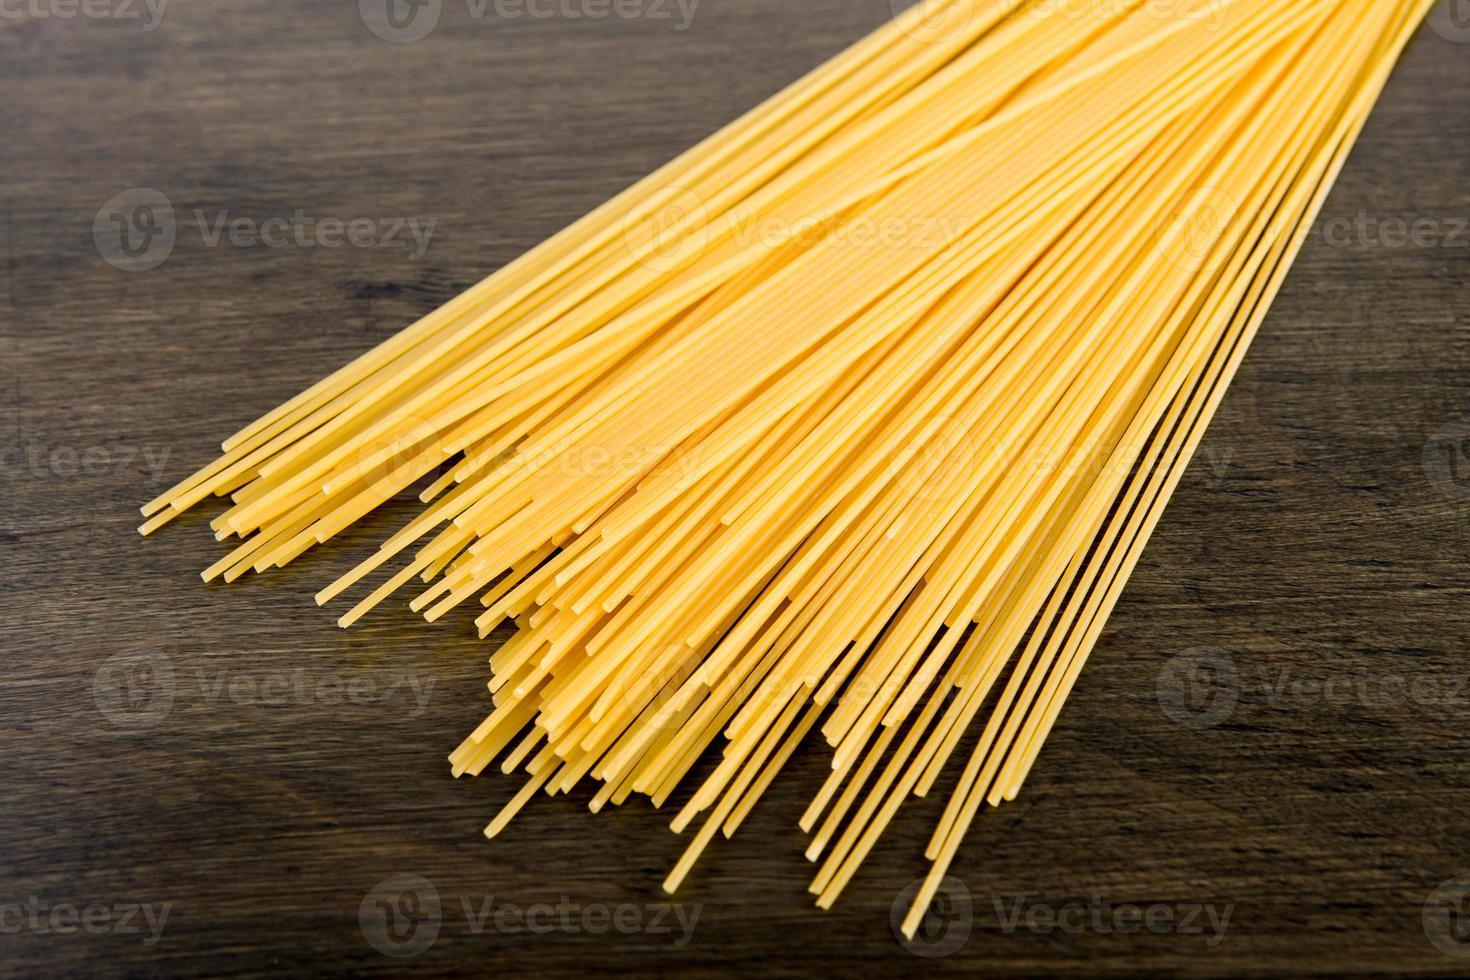 Italiaanse spaghetti op een houten bord foto